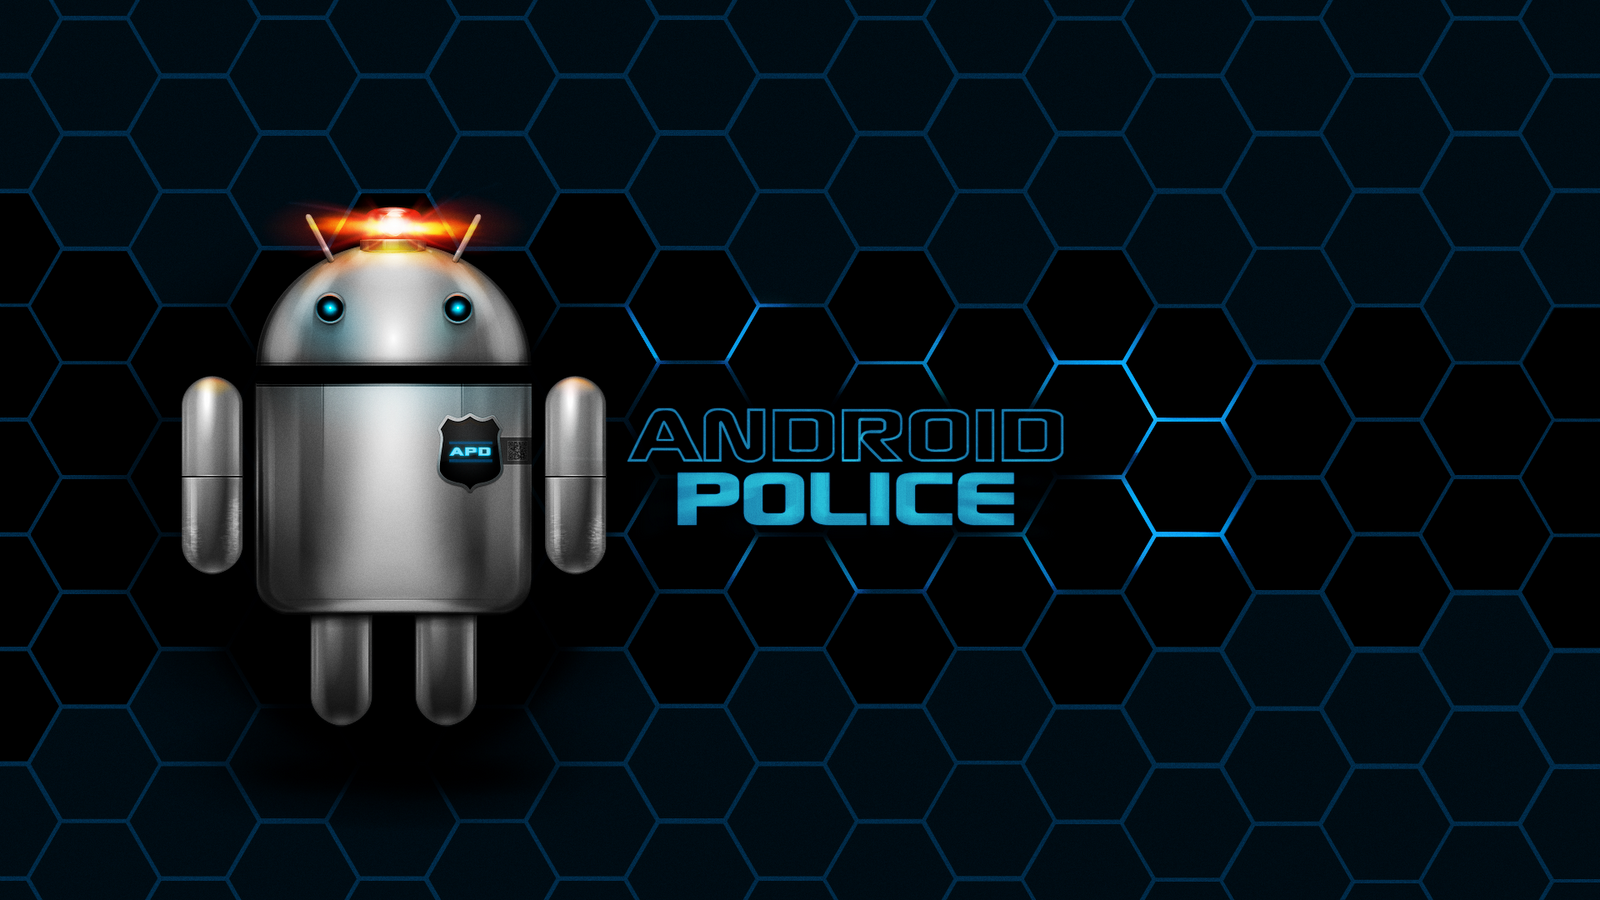 Robot Police Wallpaper 1600x900